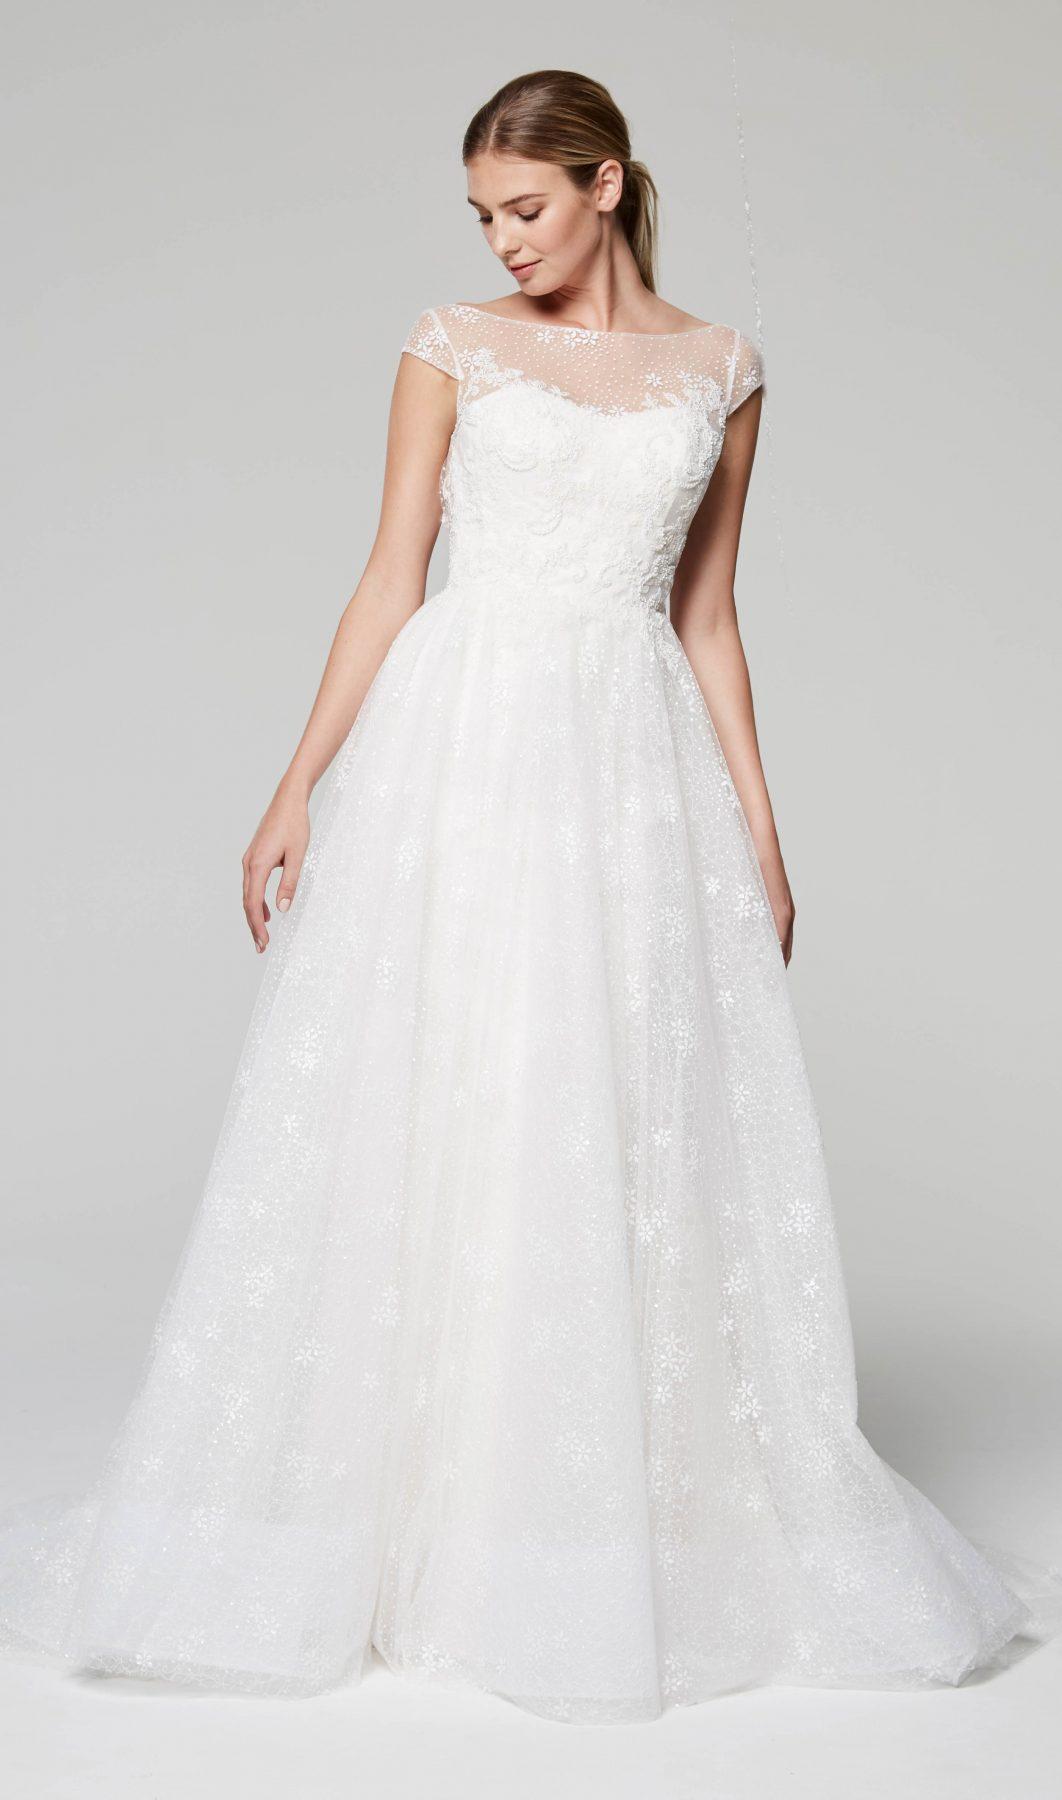 Illusion Neckline Cap Sleeve Lace Wedding Dress   Kleinfeld Bridal